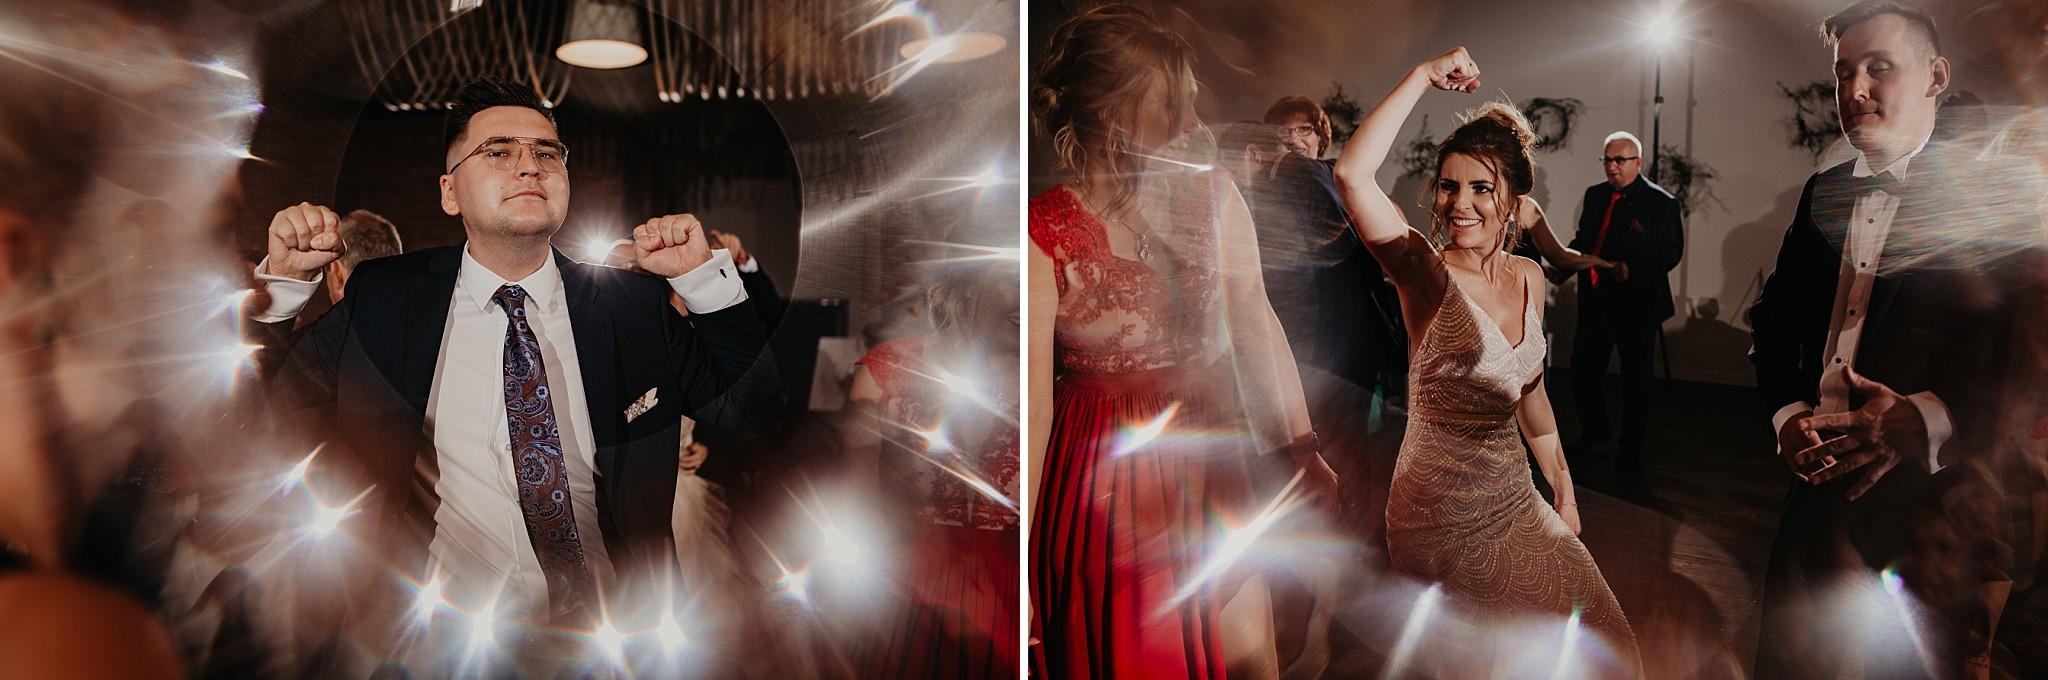 fotograf poznan wesele dobra truskawka piekne wesele pod poznaniem wesele w dobrej truskawce piekna para mloda slub marzen slub koronawirus slub listopad wesele koronawirus 399